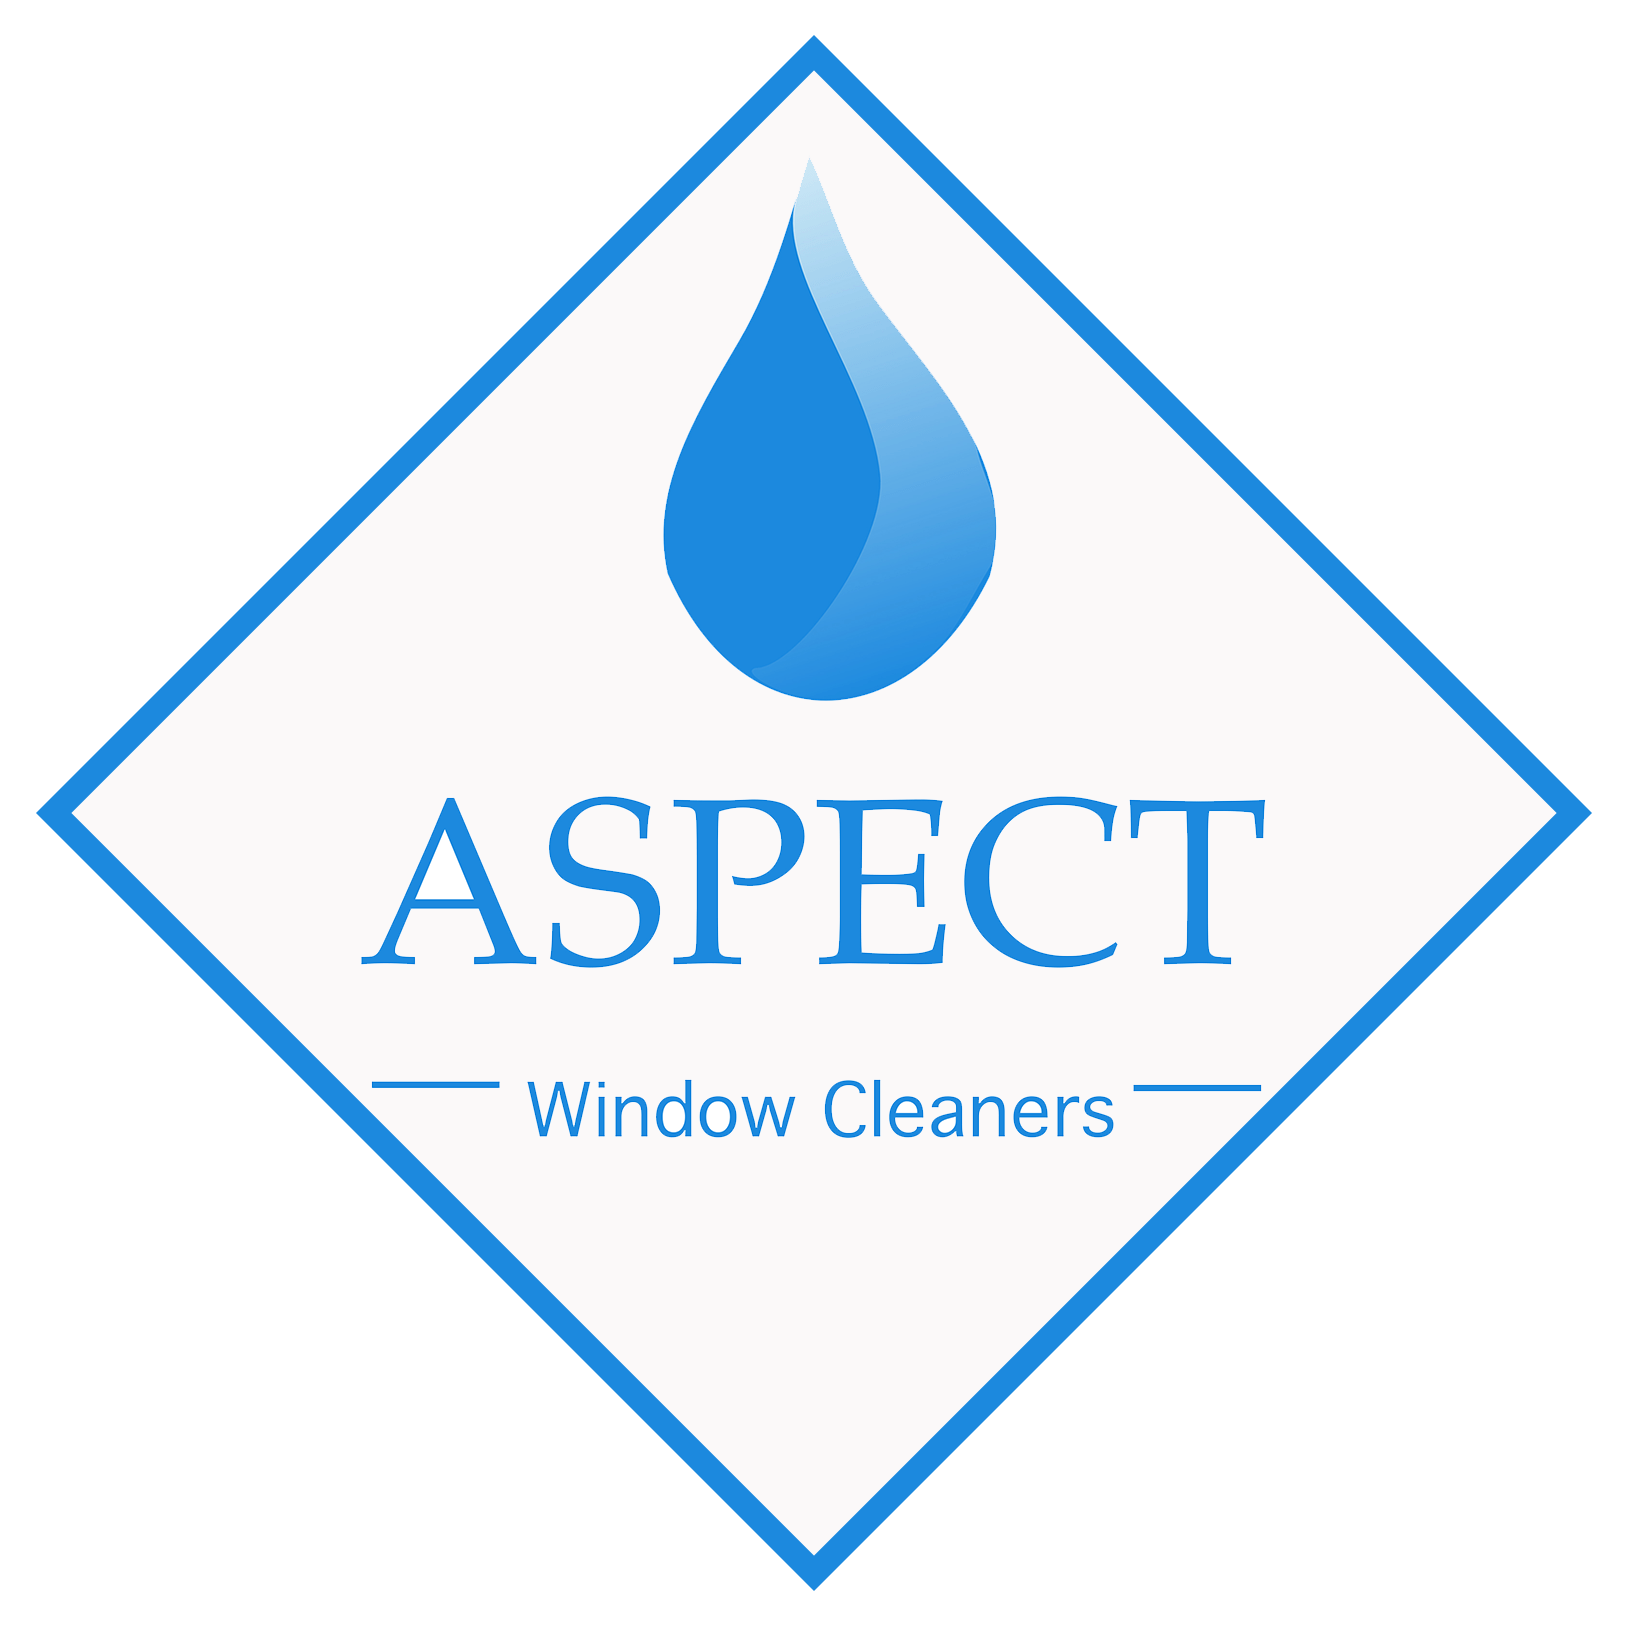 Aspect Window Cleaners Logo